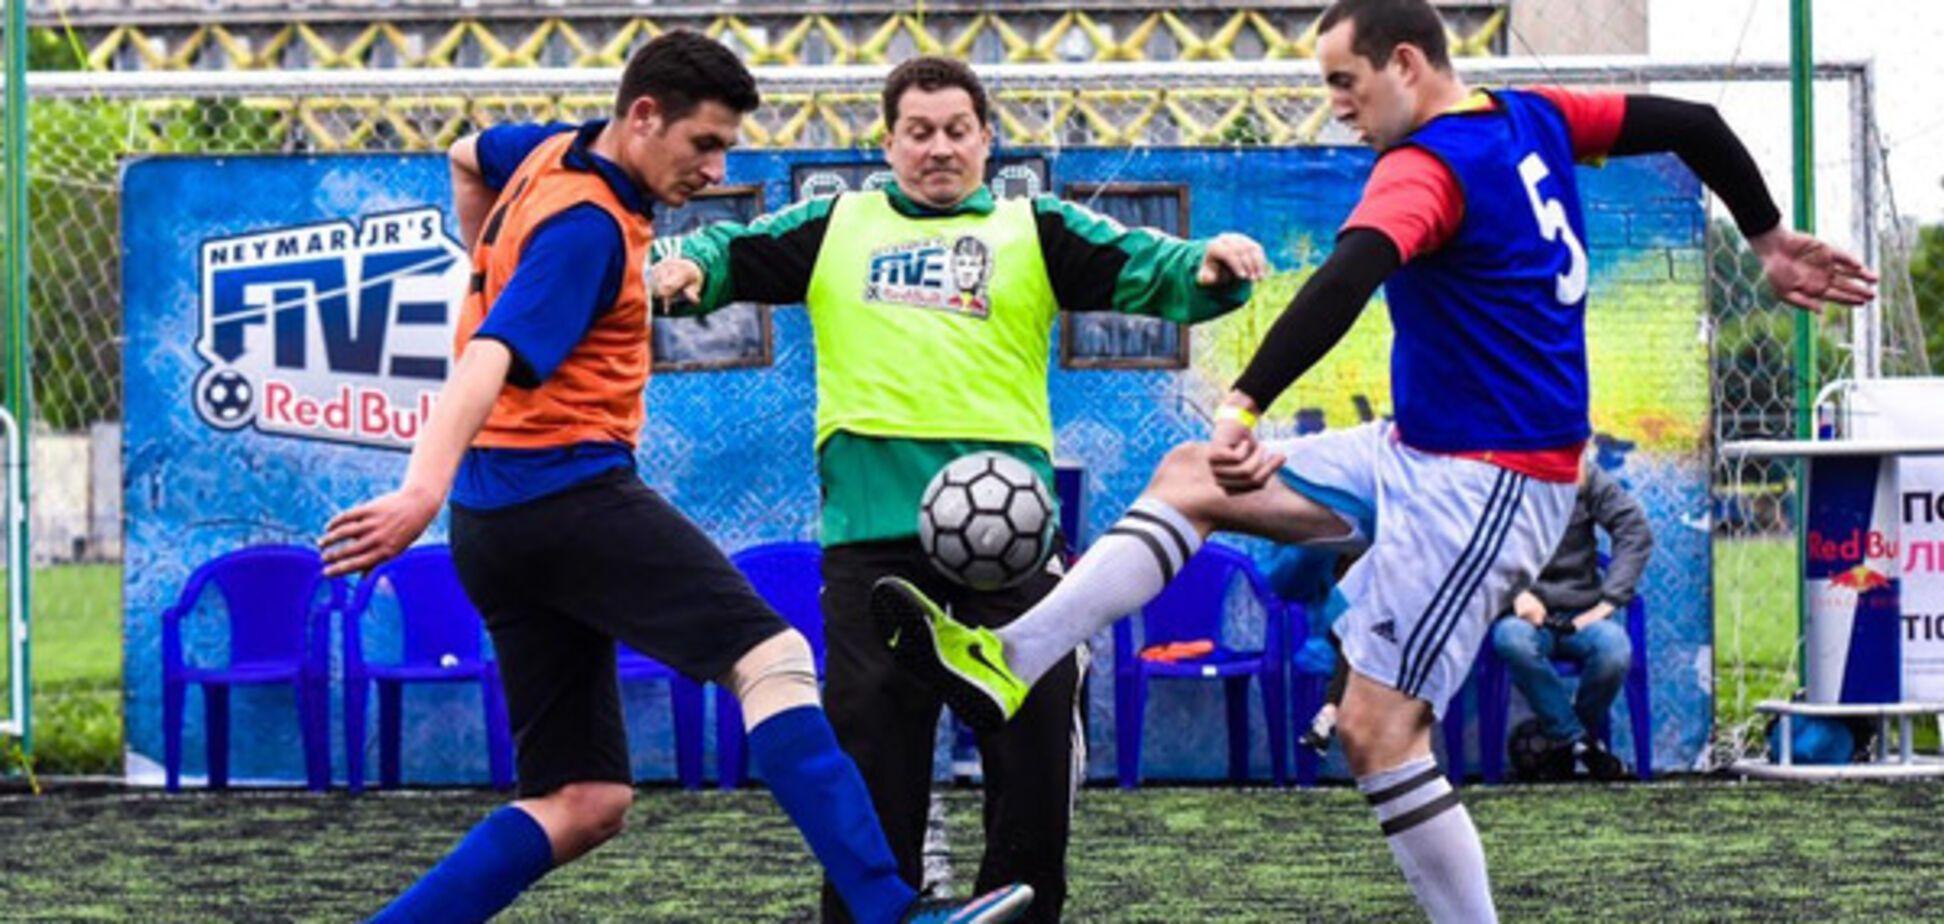 Iron Fists, Фрегат и Lynx представят Одессу  в Национальном Финале Neymar Jr's Five